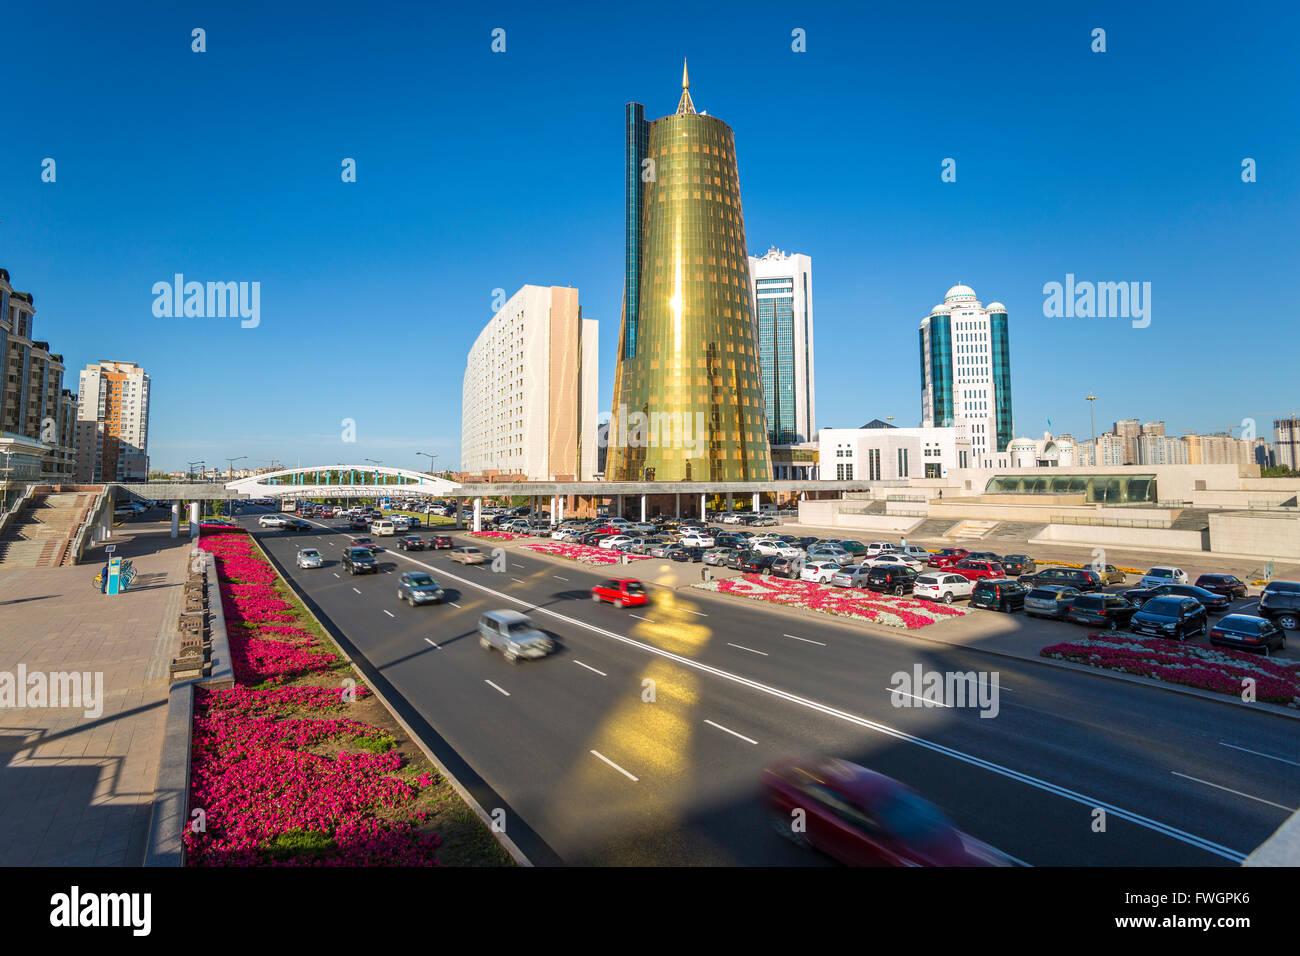 Zweibettzimmer golden konische Geschäftszentren, Astana, Kasachstan, Zentralasien Stockbild